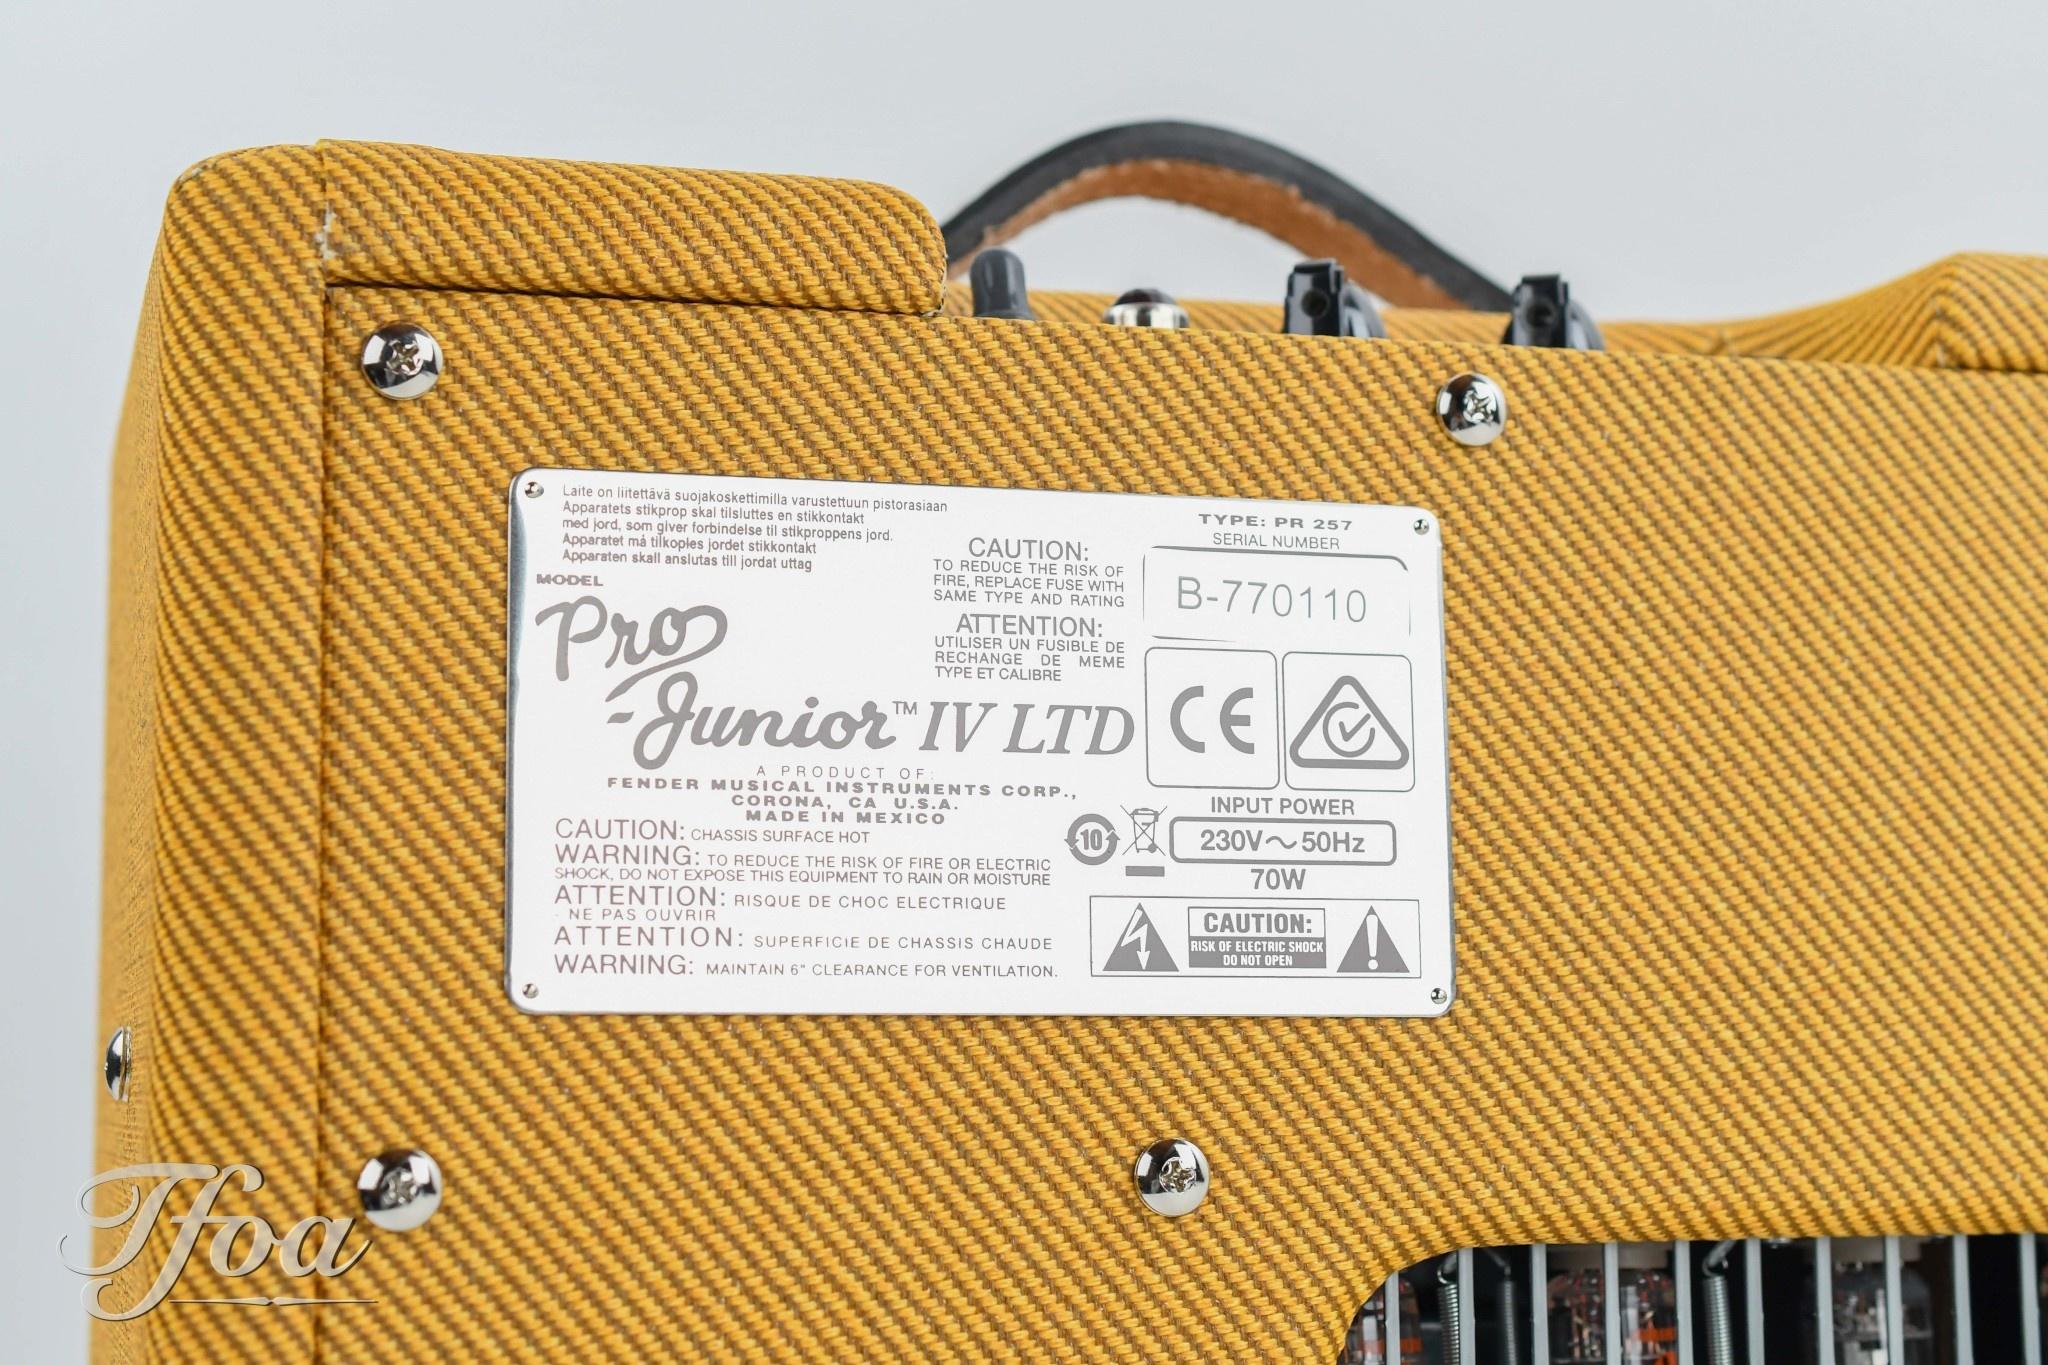 Fender Fender Pro Junior IV LTD